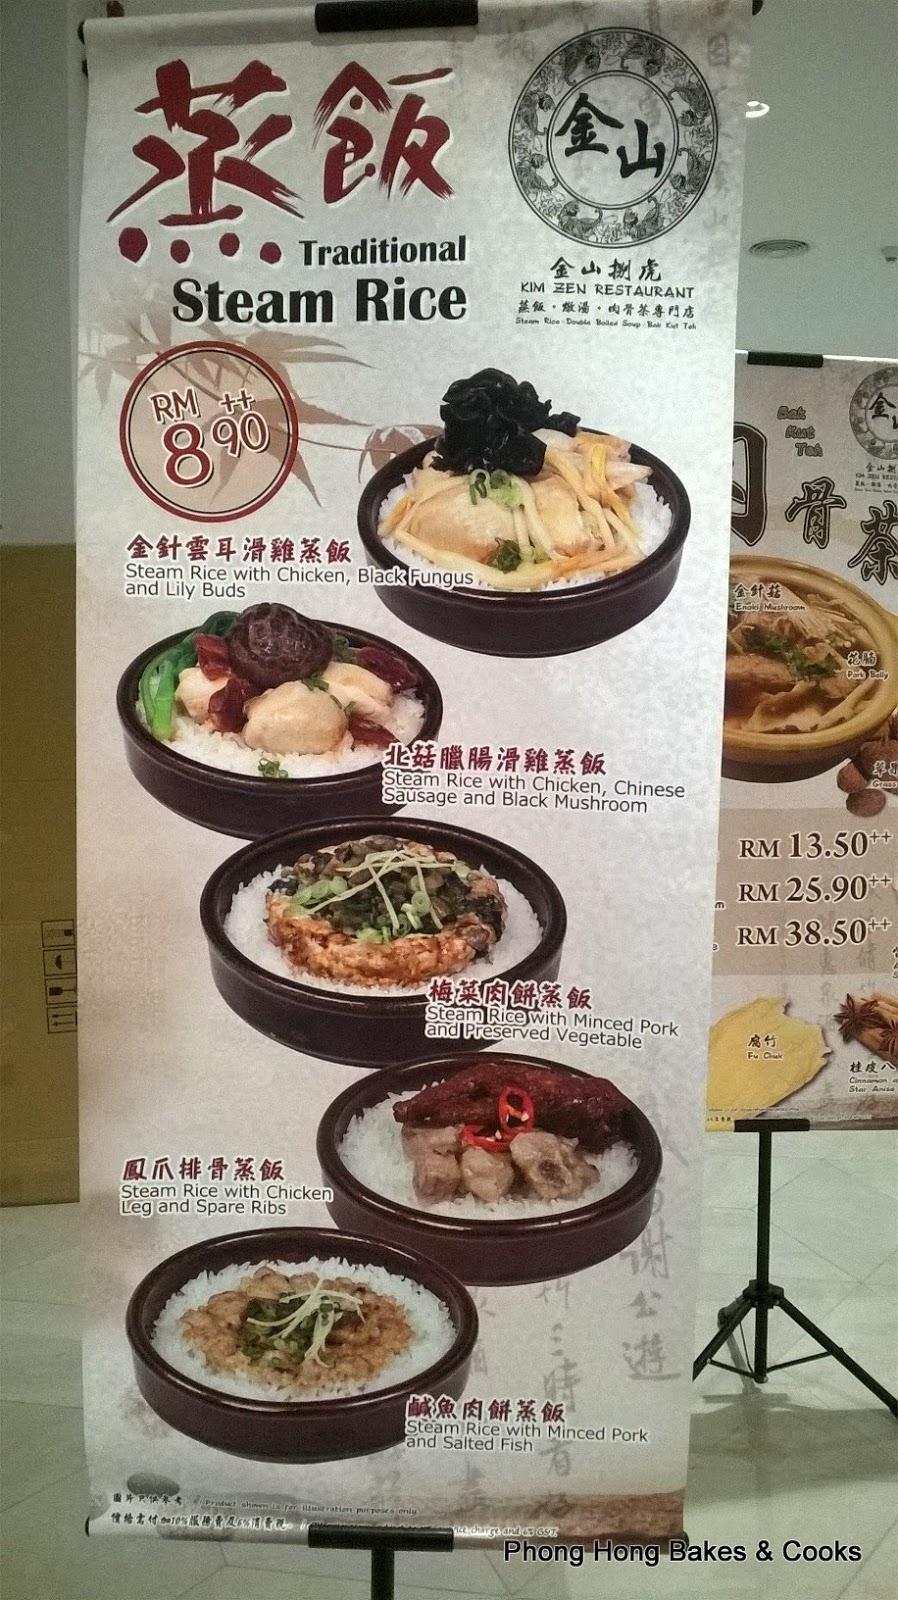 zen restaurant gold coast menu teure schmuck f r sie foto blog. Black Bedroom Furniture Sets. Home Design Ideas